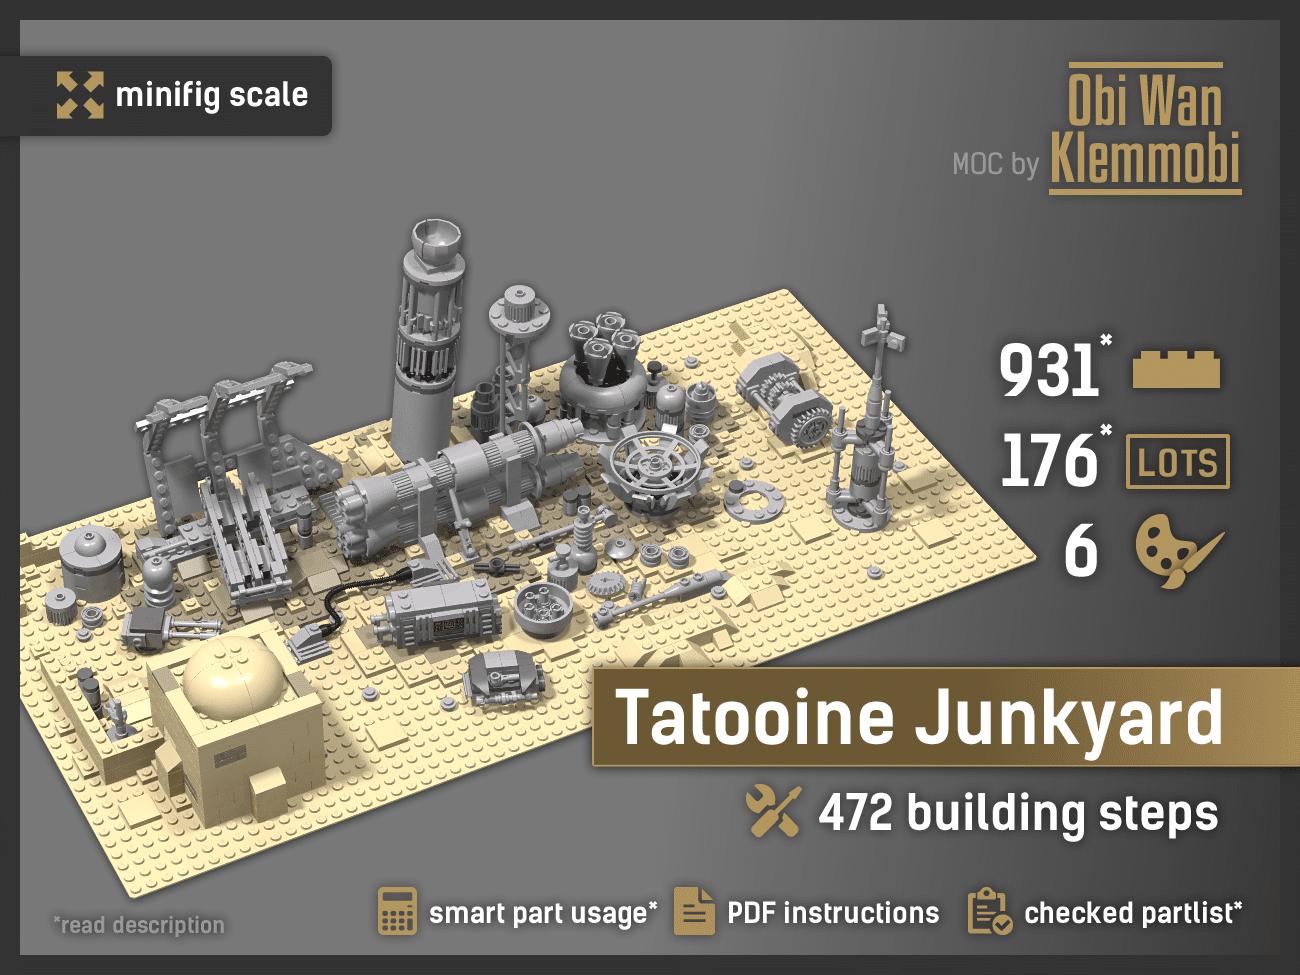 Tatooine Junkyard